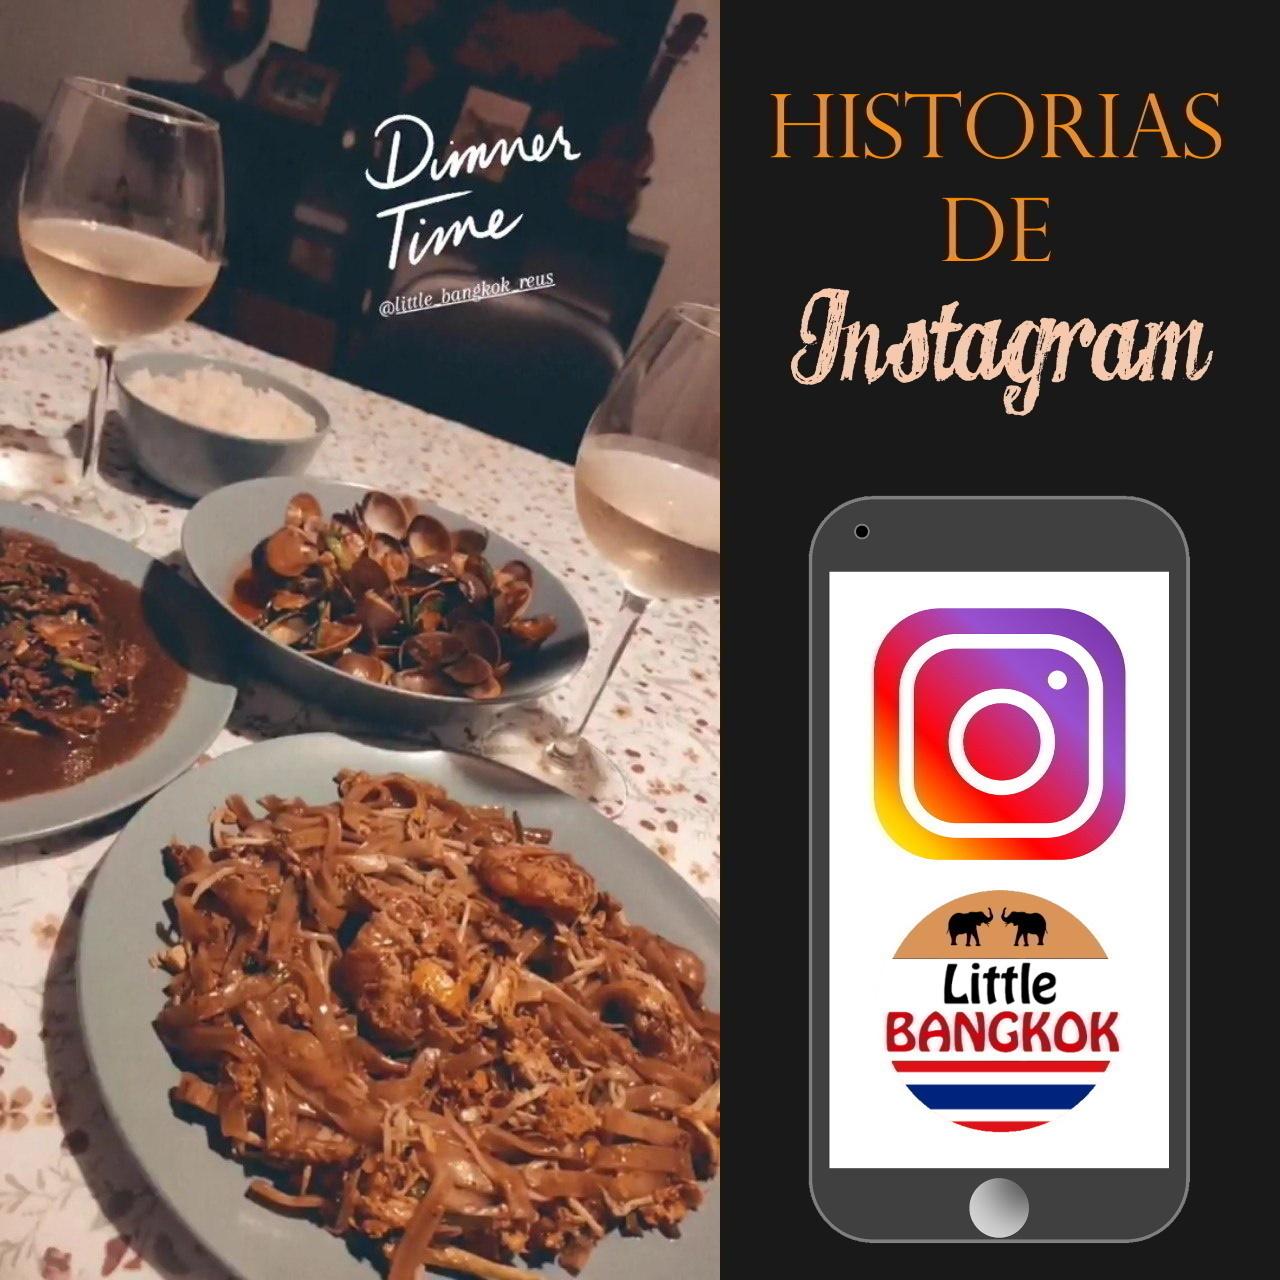 Historias de Instagram - 09 - Setembre 5